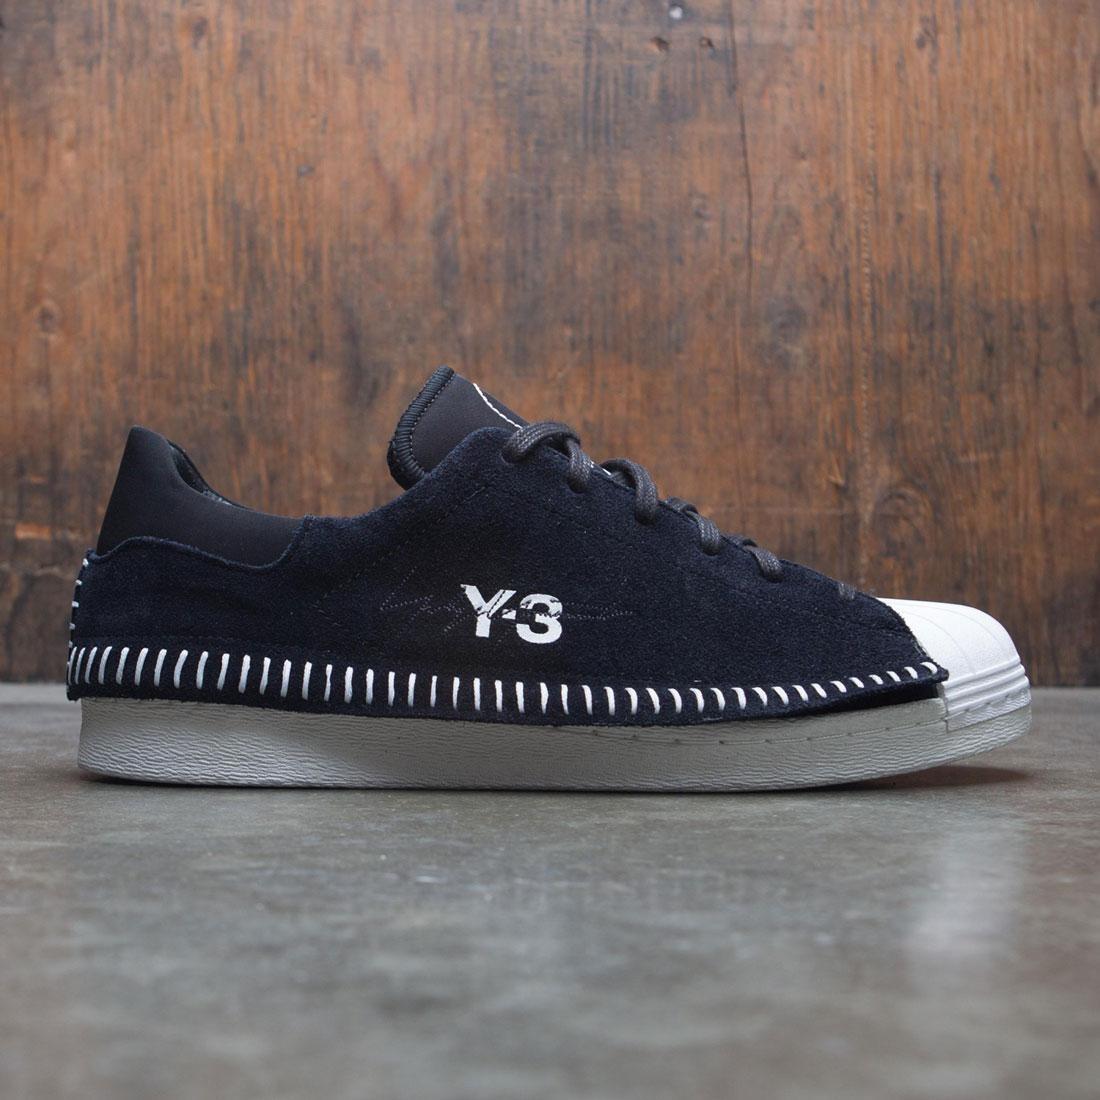 Adidas Y-3 Men Bynder Super (black / core white)